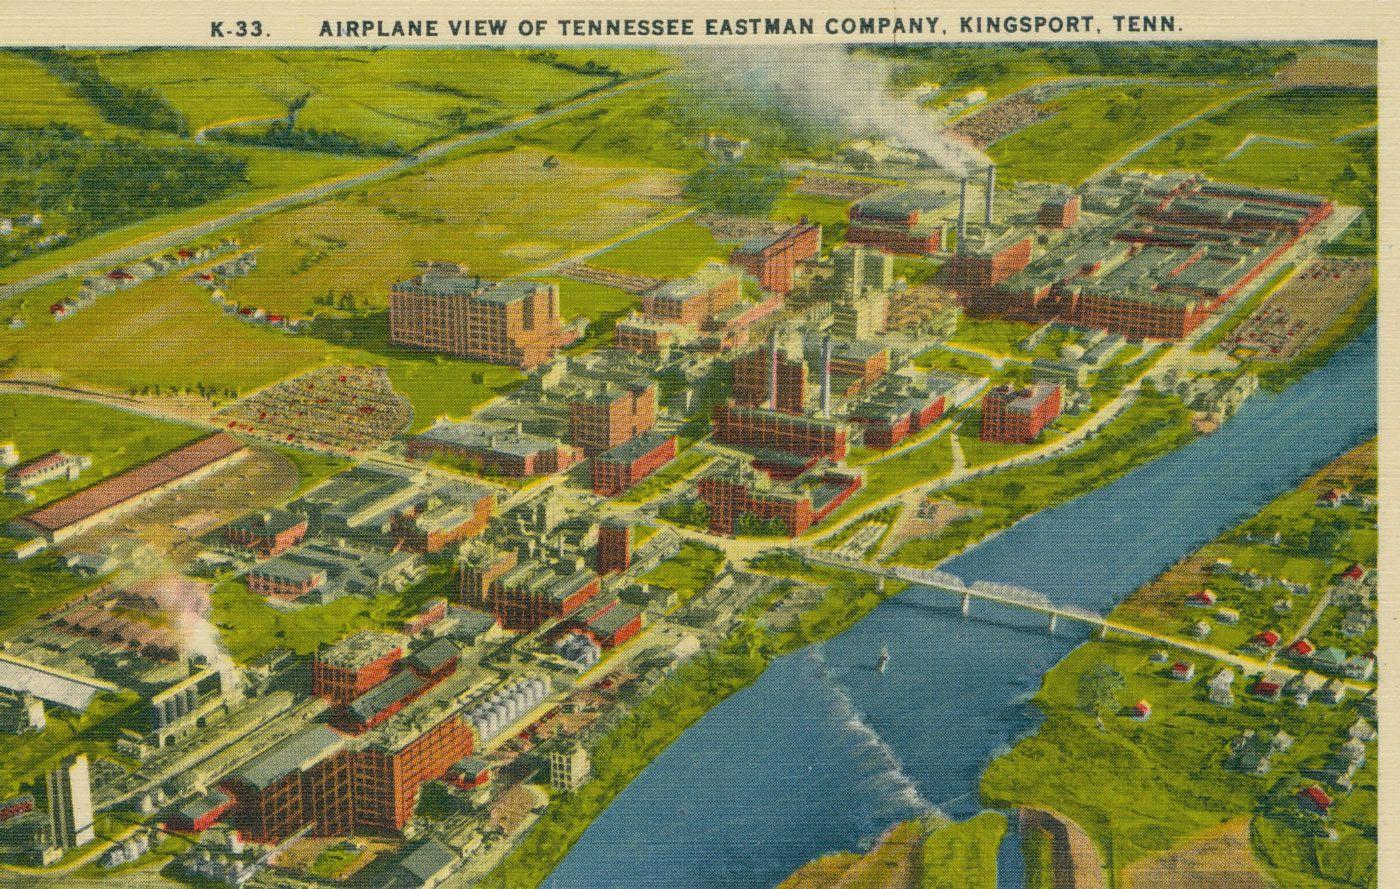 Tennessee Eastman Company